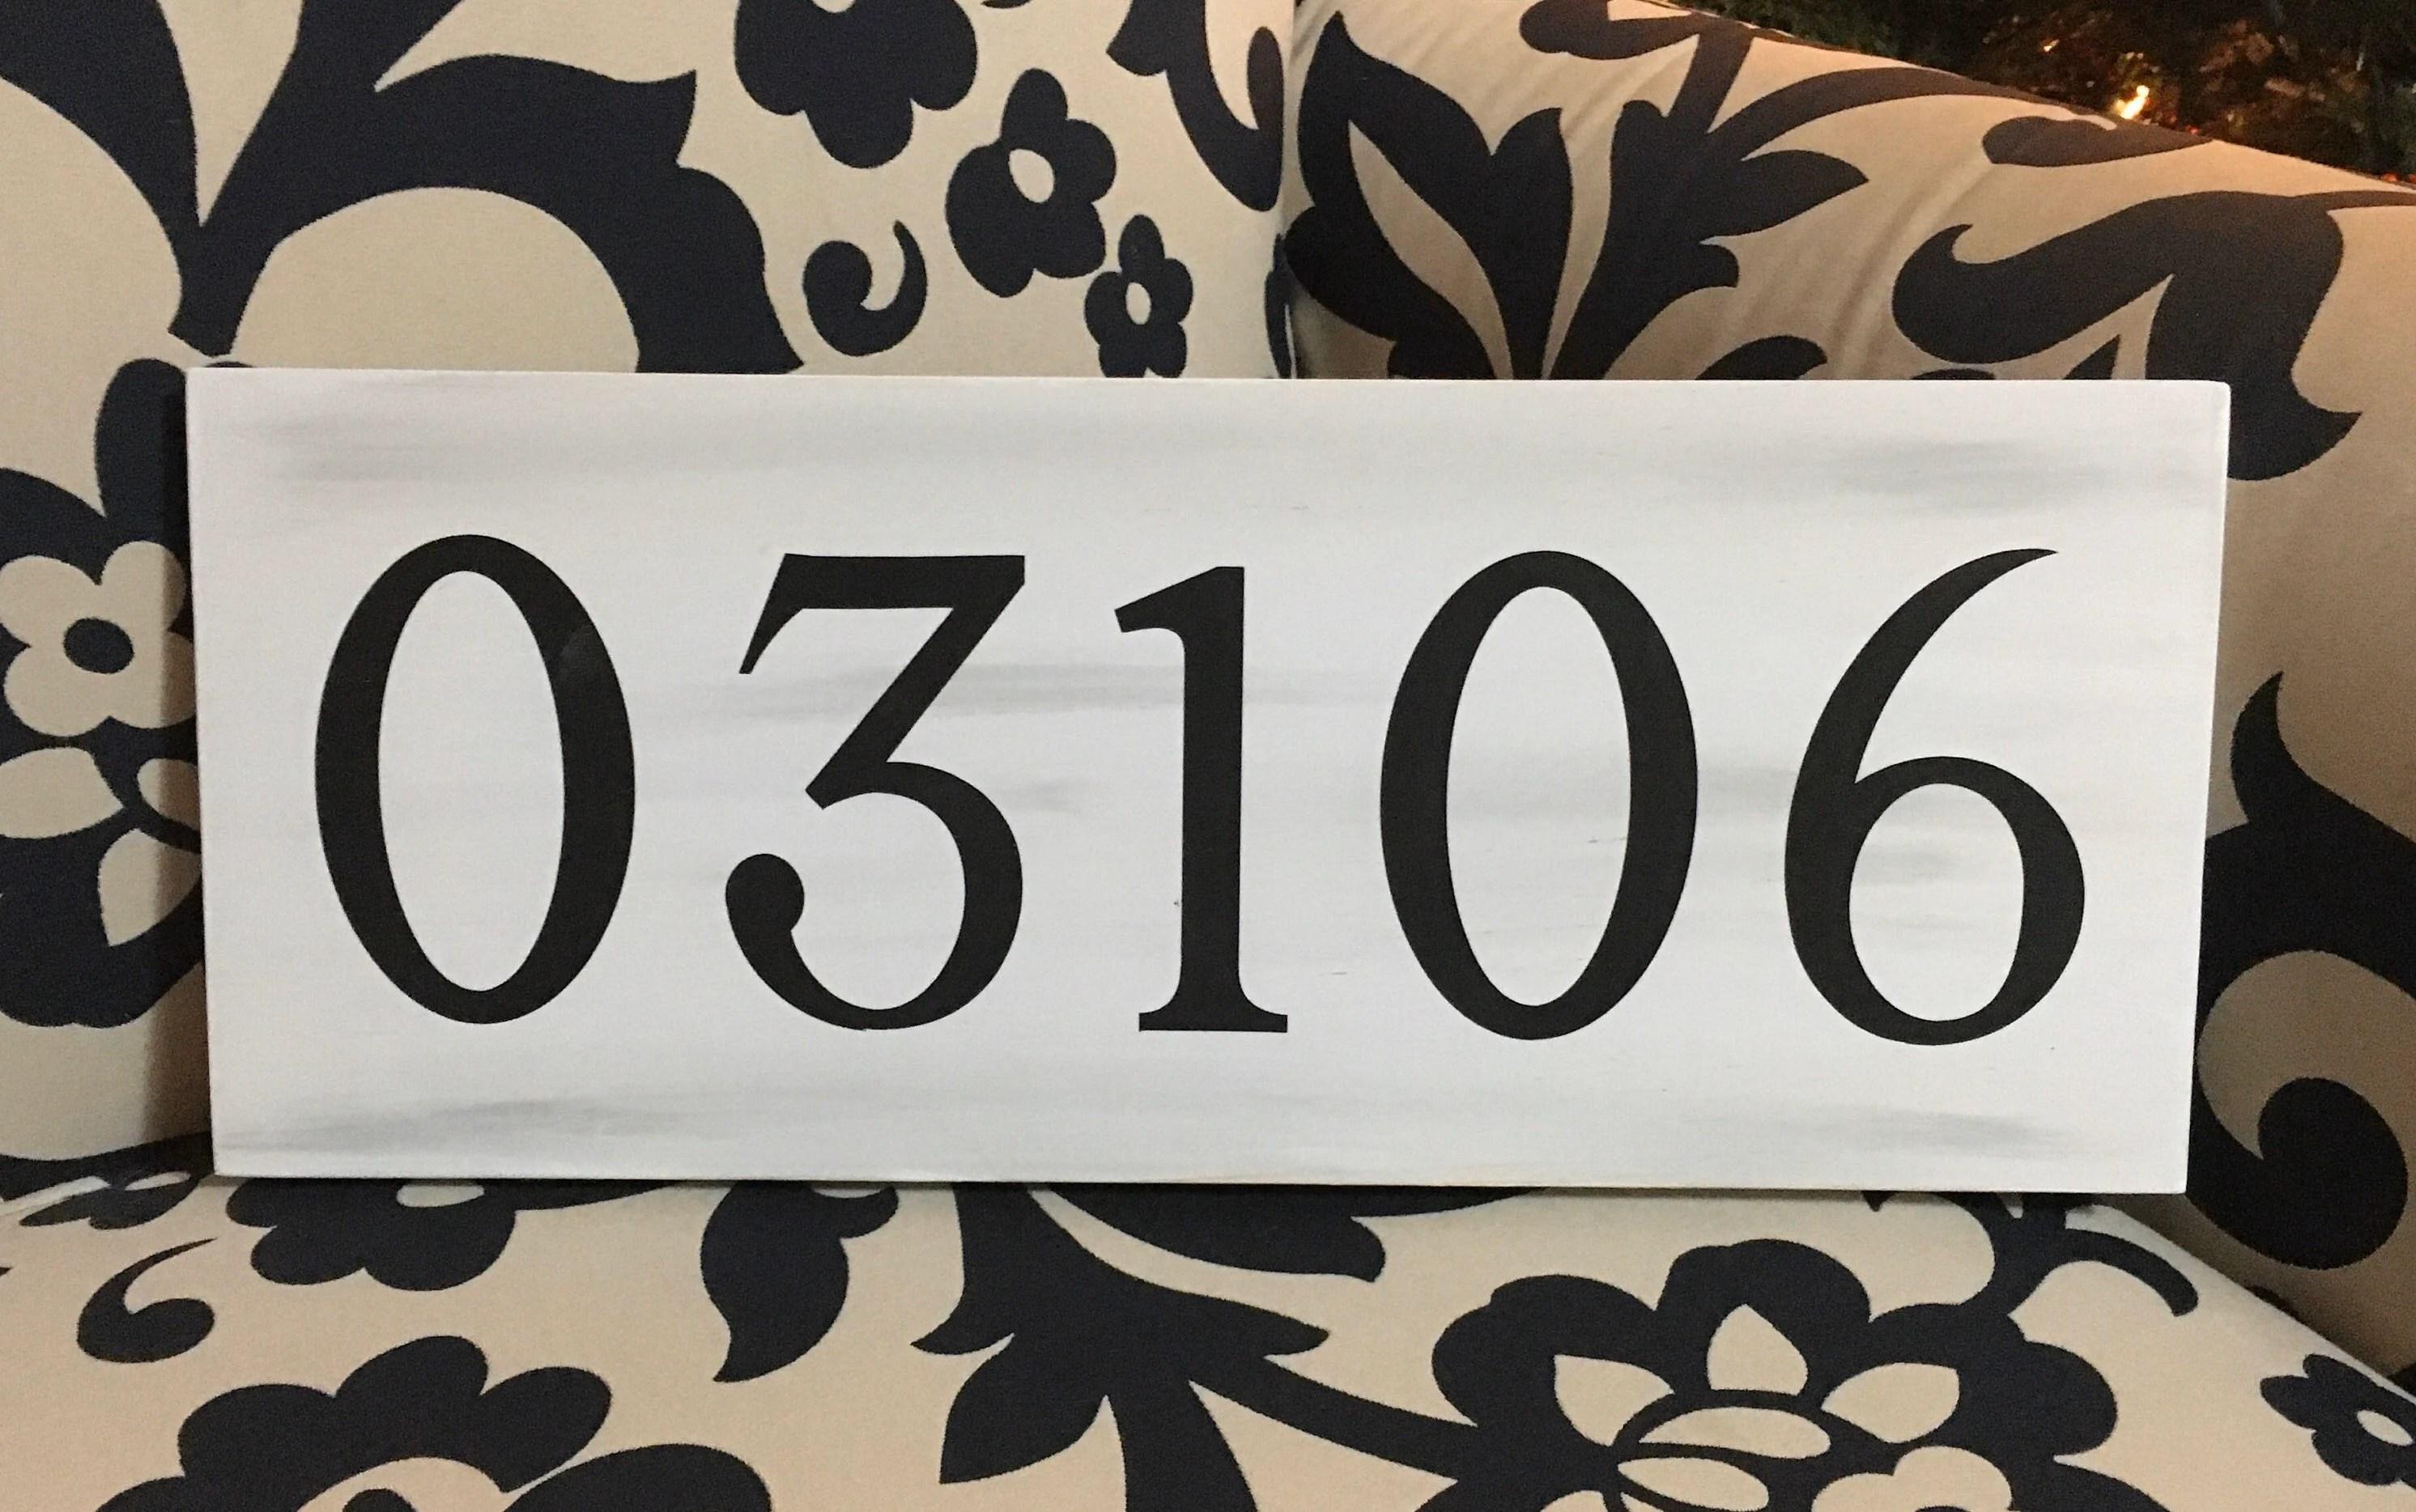 custom zip code wood sign